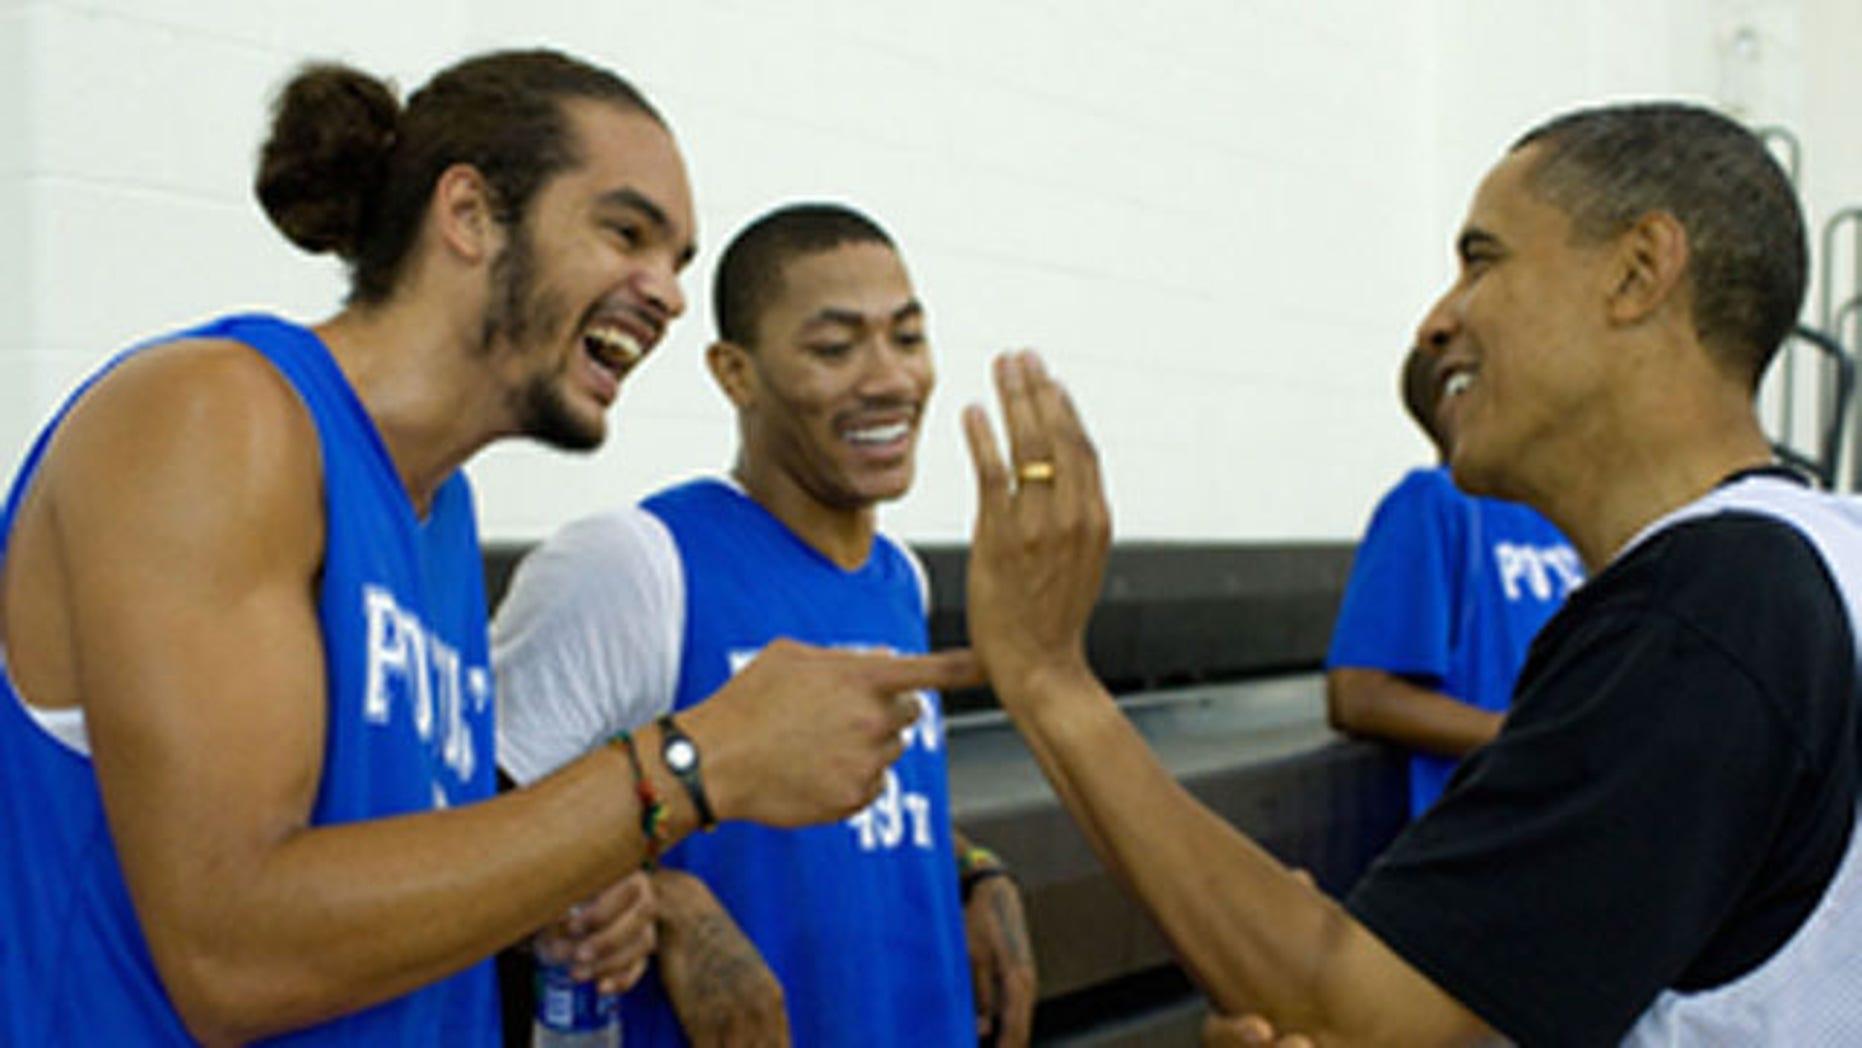 Aug. 8: President Obama talks with Joakim Noah (left) and Derrick Rose of the Chicago Bulls.